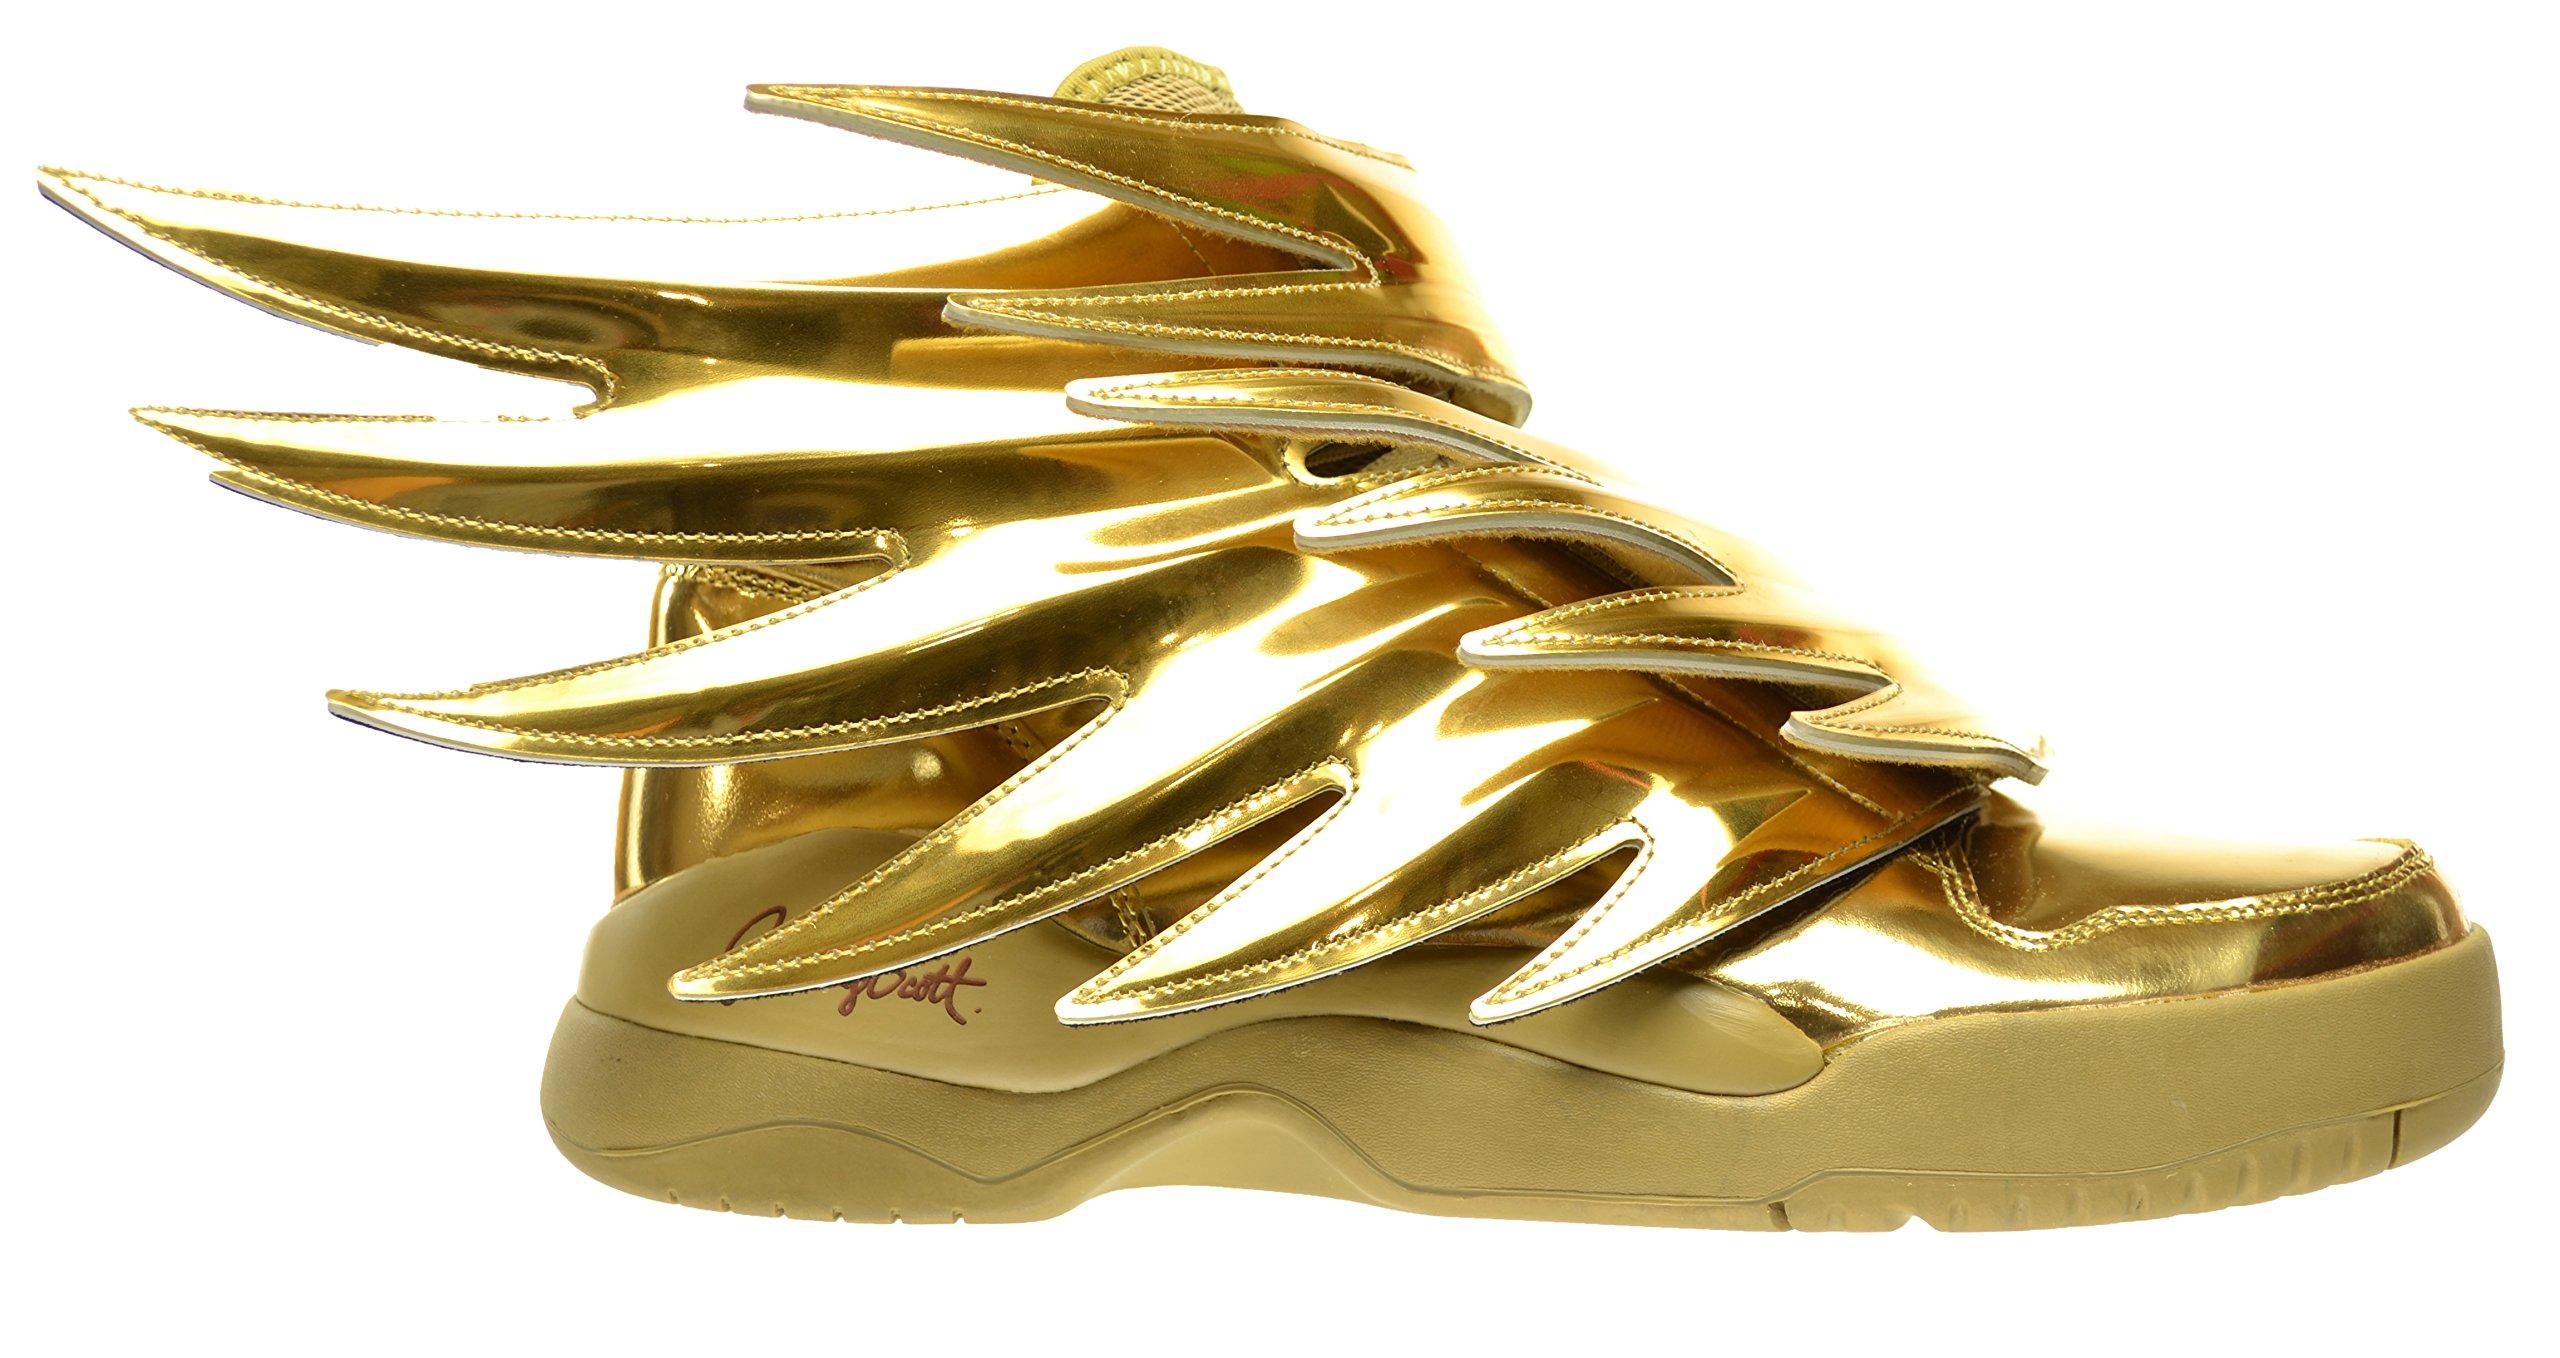 Adidas Js Wings 3 0 Gold Men S Shoes Gold Metallic B35651 Buy Online In Germany At Desertcart De Productid 163628595